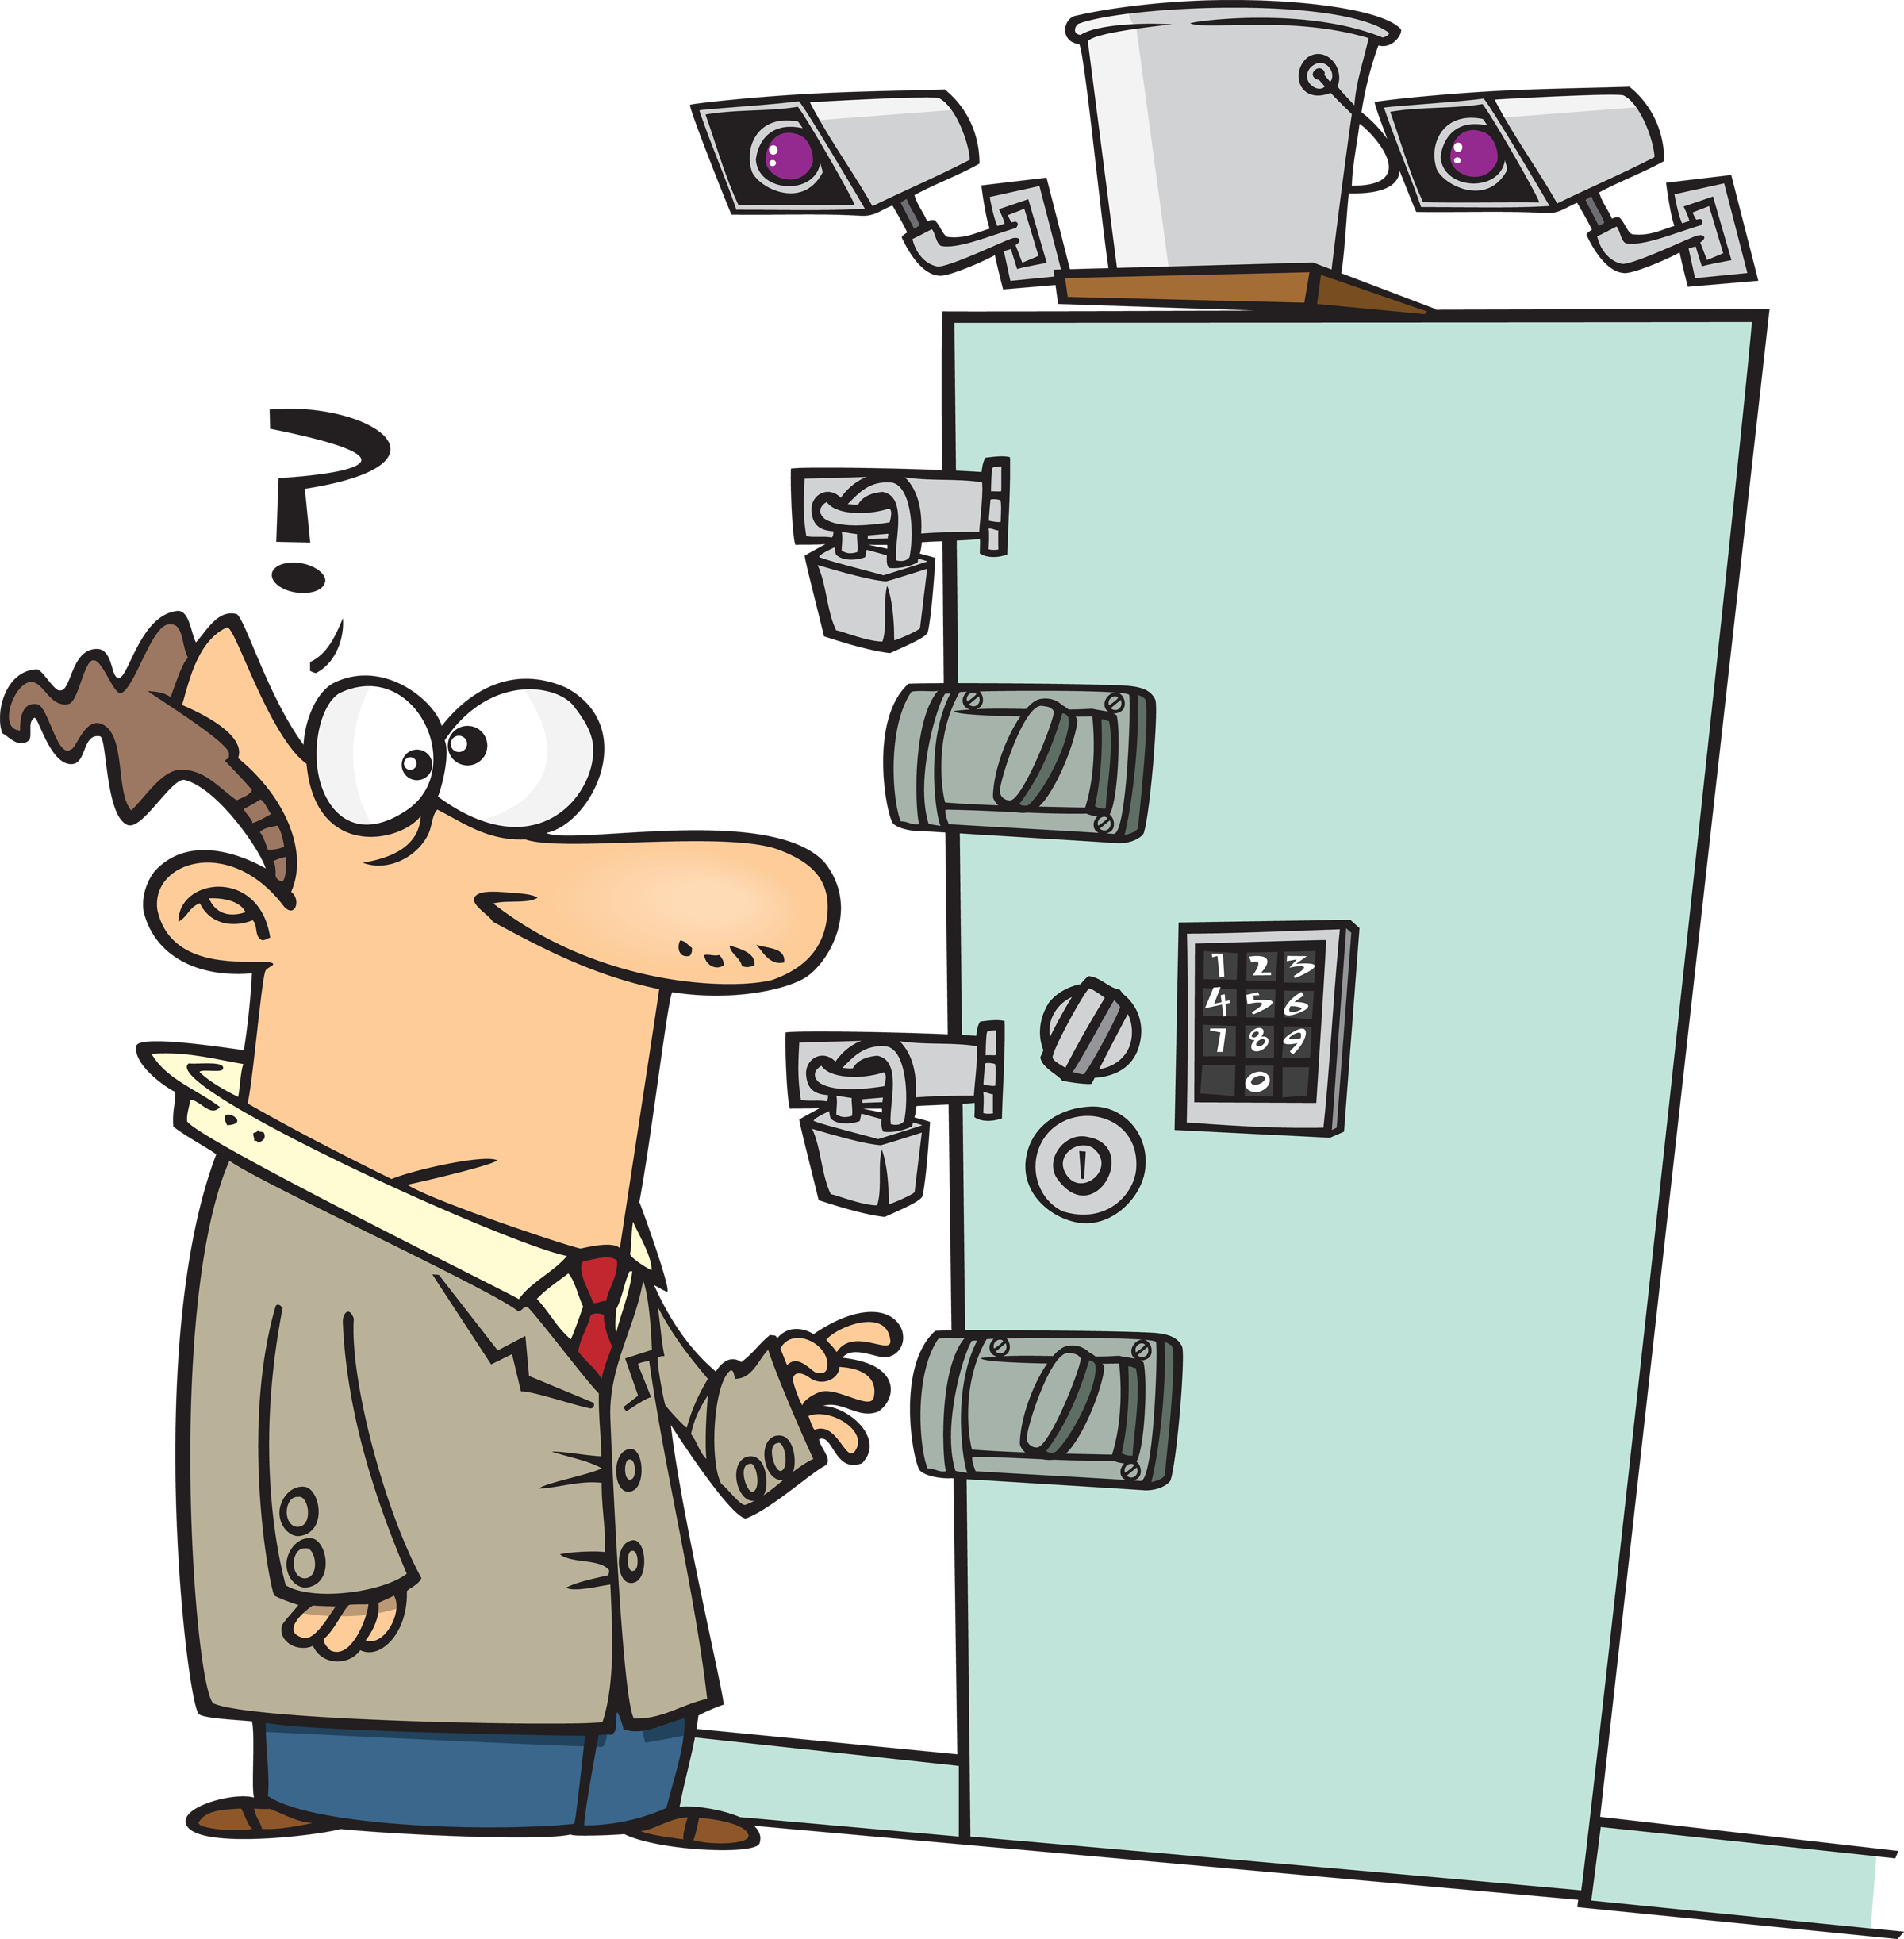 Free Doorlock Cliparts, Download Free Clip Art, Free Clip.